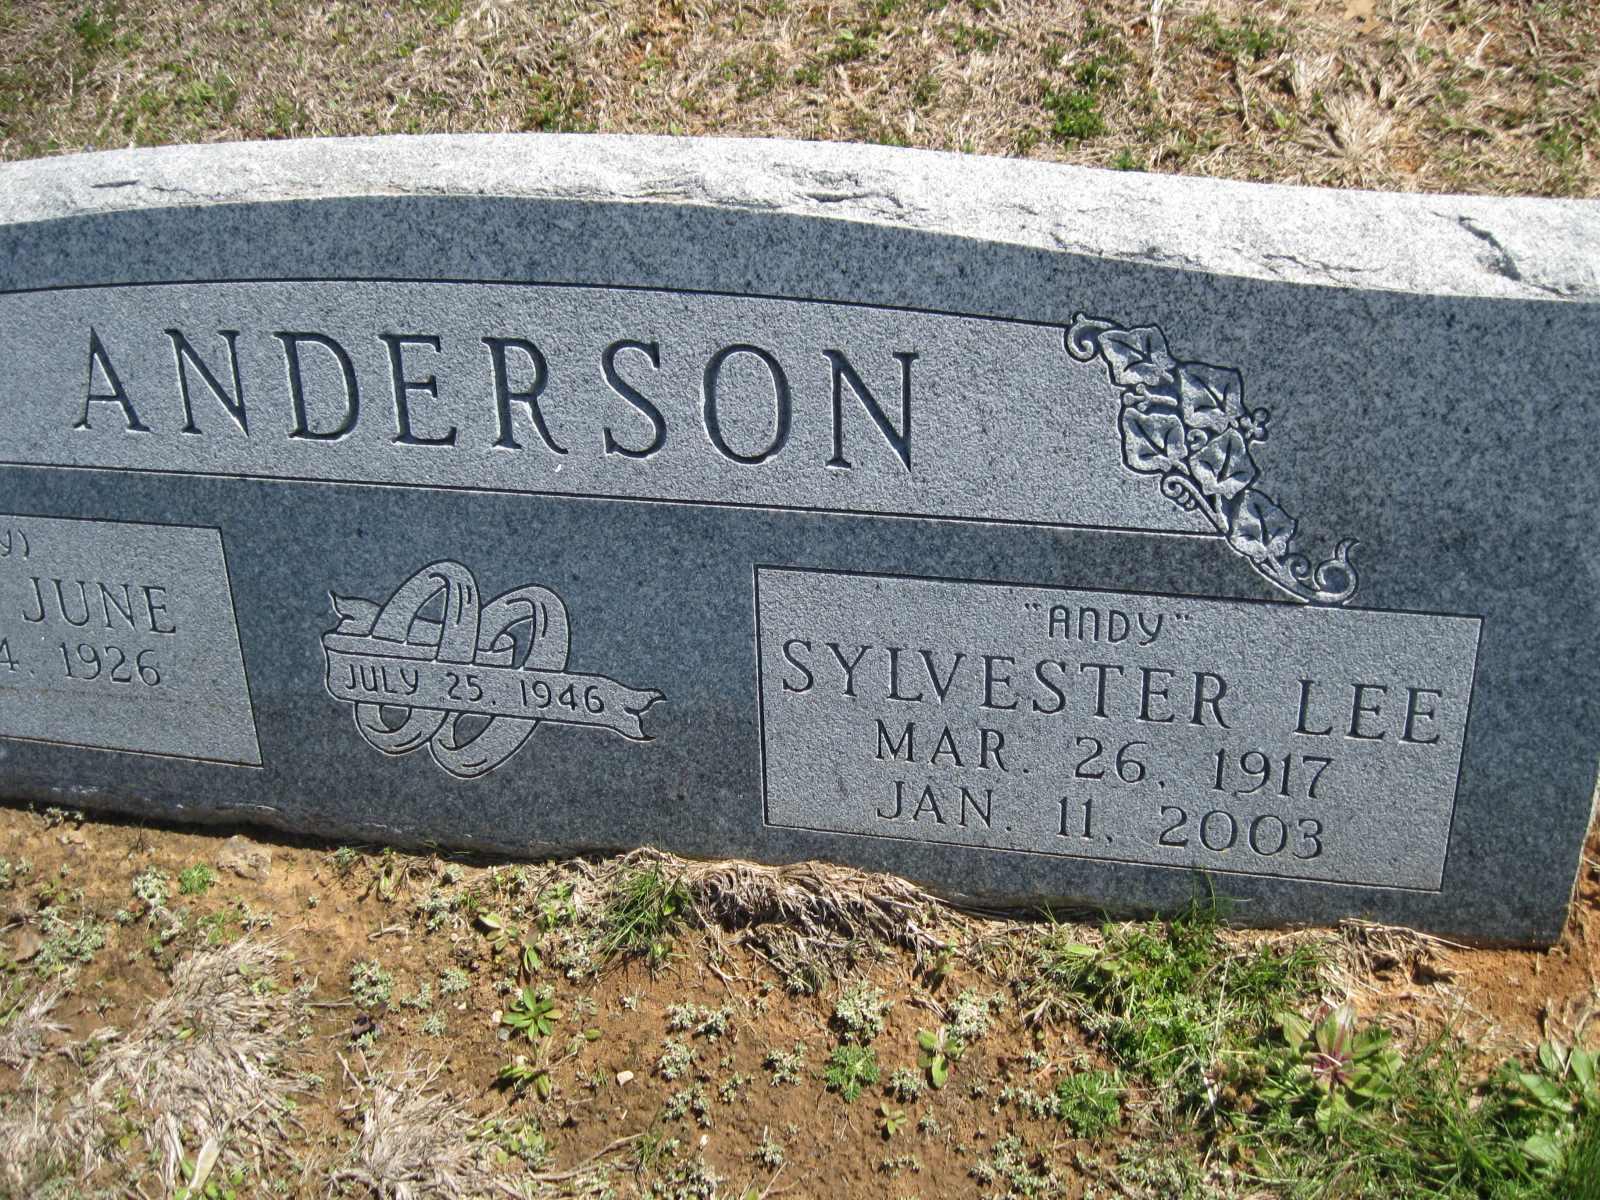 1ec99491bbd 67 - ANDERSON, WILLIAM - Dec 22, 1852 - July 14, 1921 - - Bridgeport-East-0067  2010#0873 - ANDRIS, TERRY R. ...